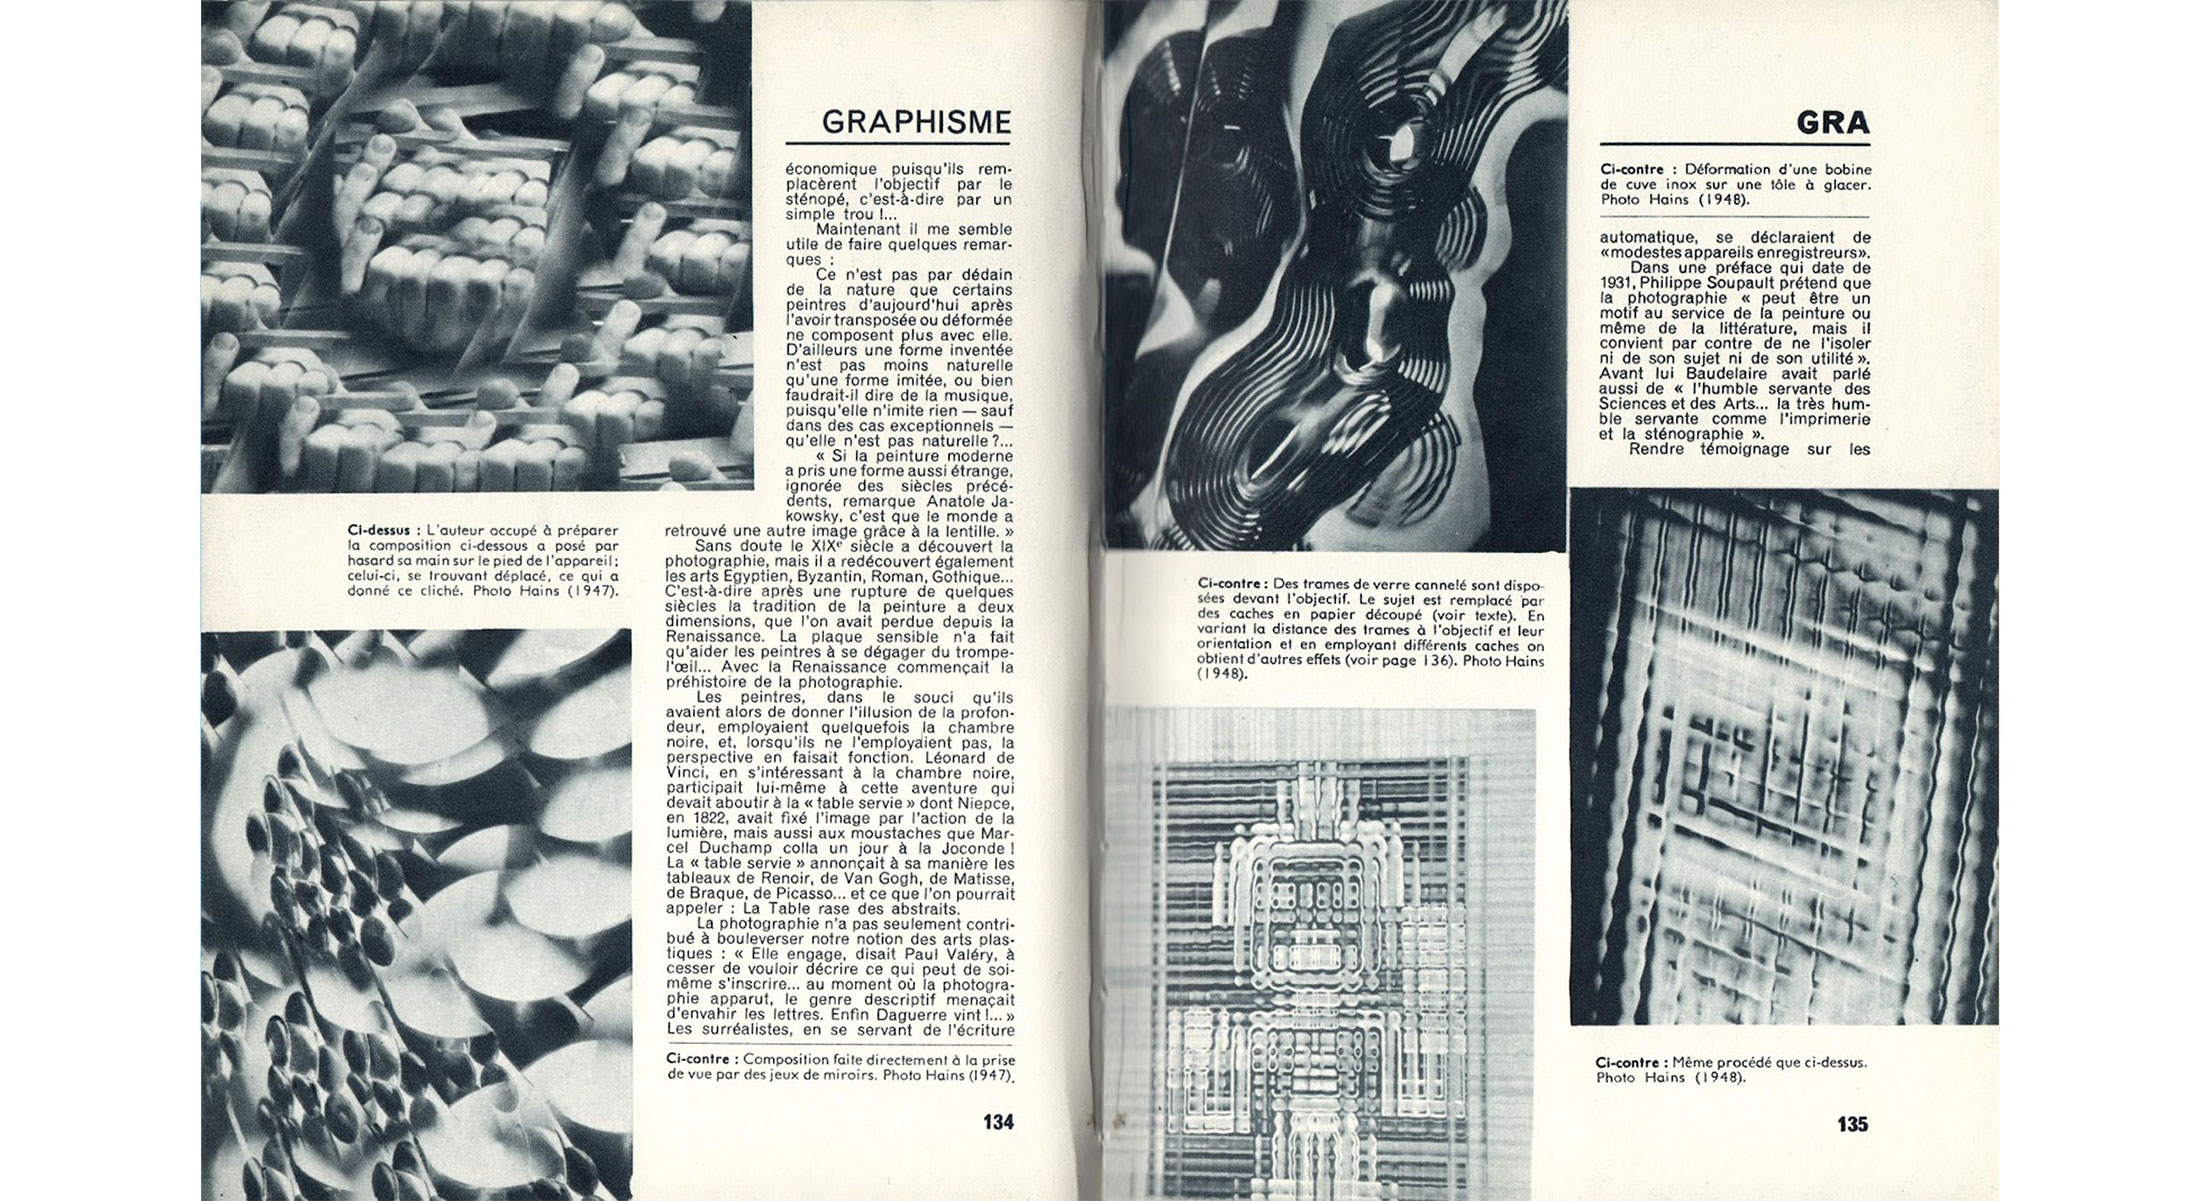 Raymond-Hains-graphisme-et-photographie-magazine-prisma-5-photographie-hypnagogique